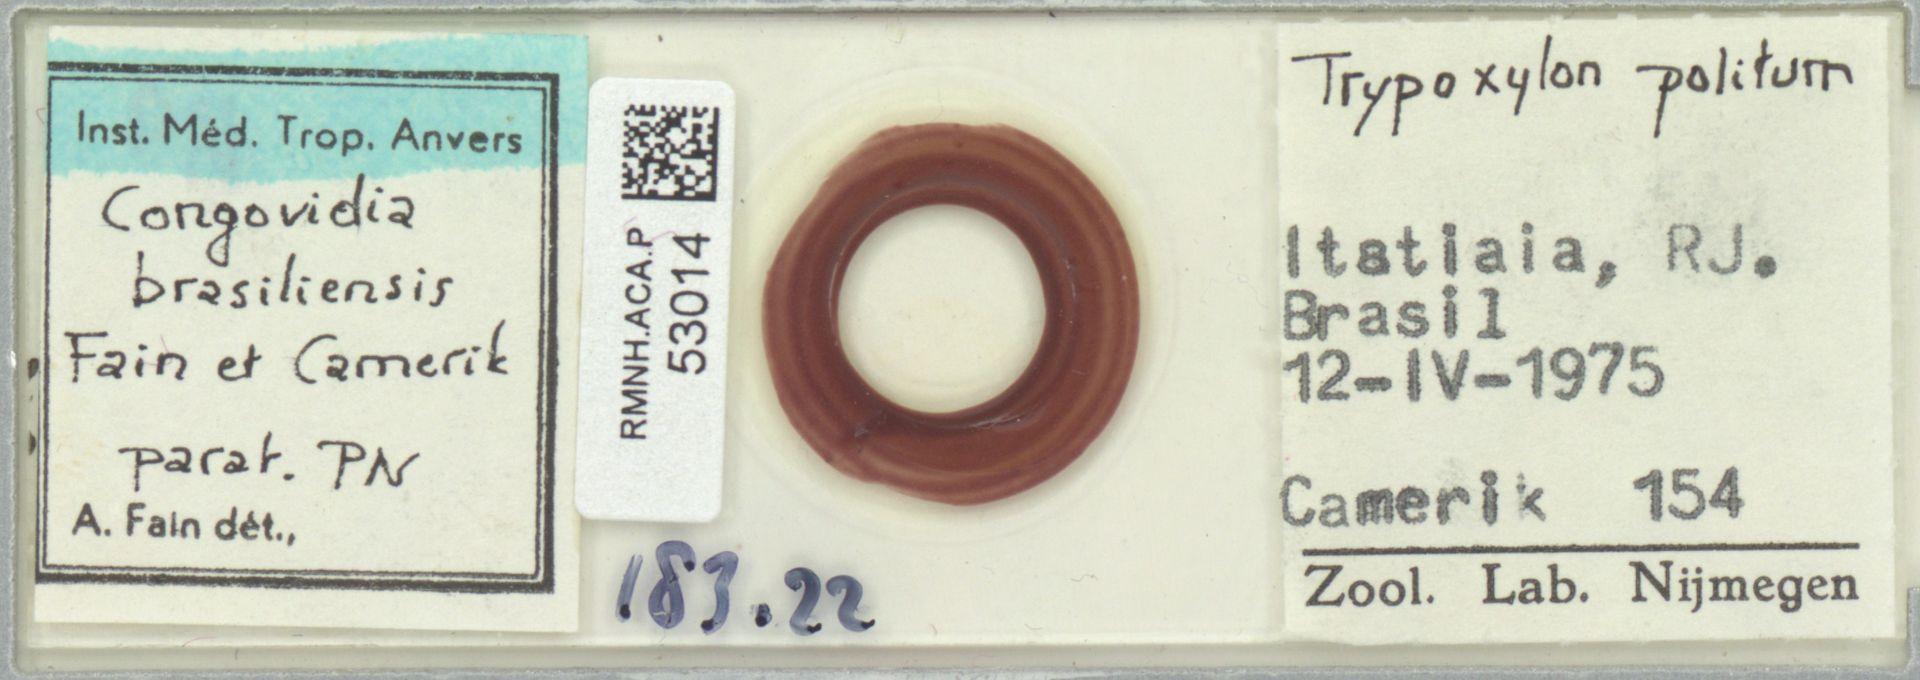 RMNH.ACA.P.53014 | Congovidia brasiliensis Fain et Camerik